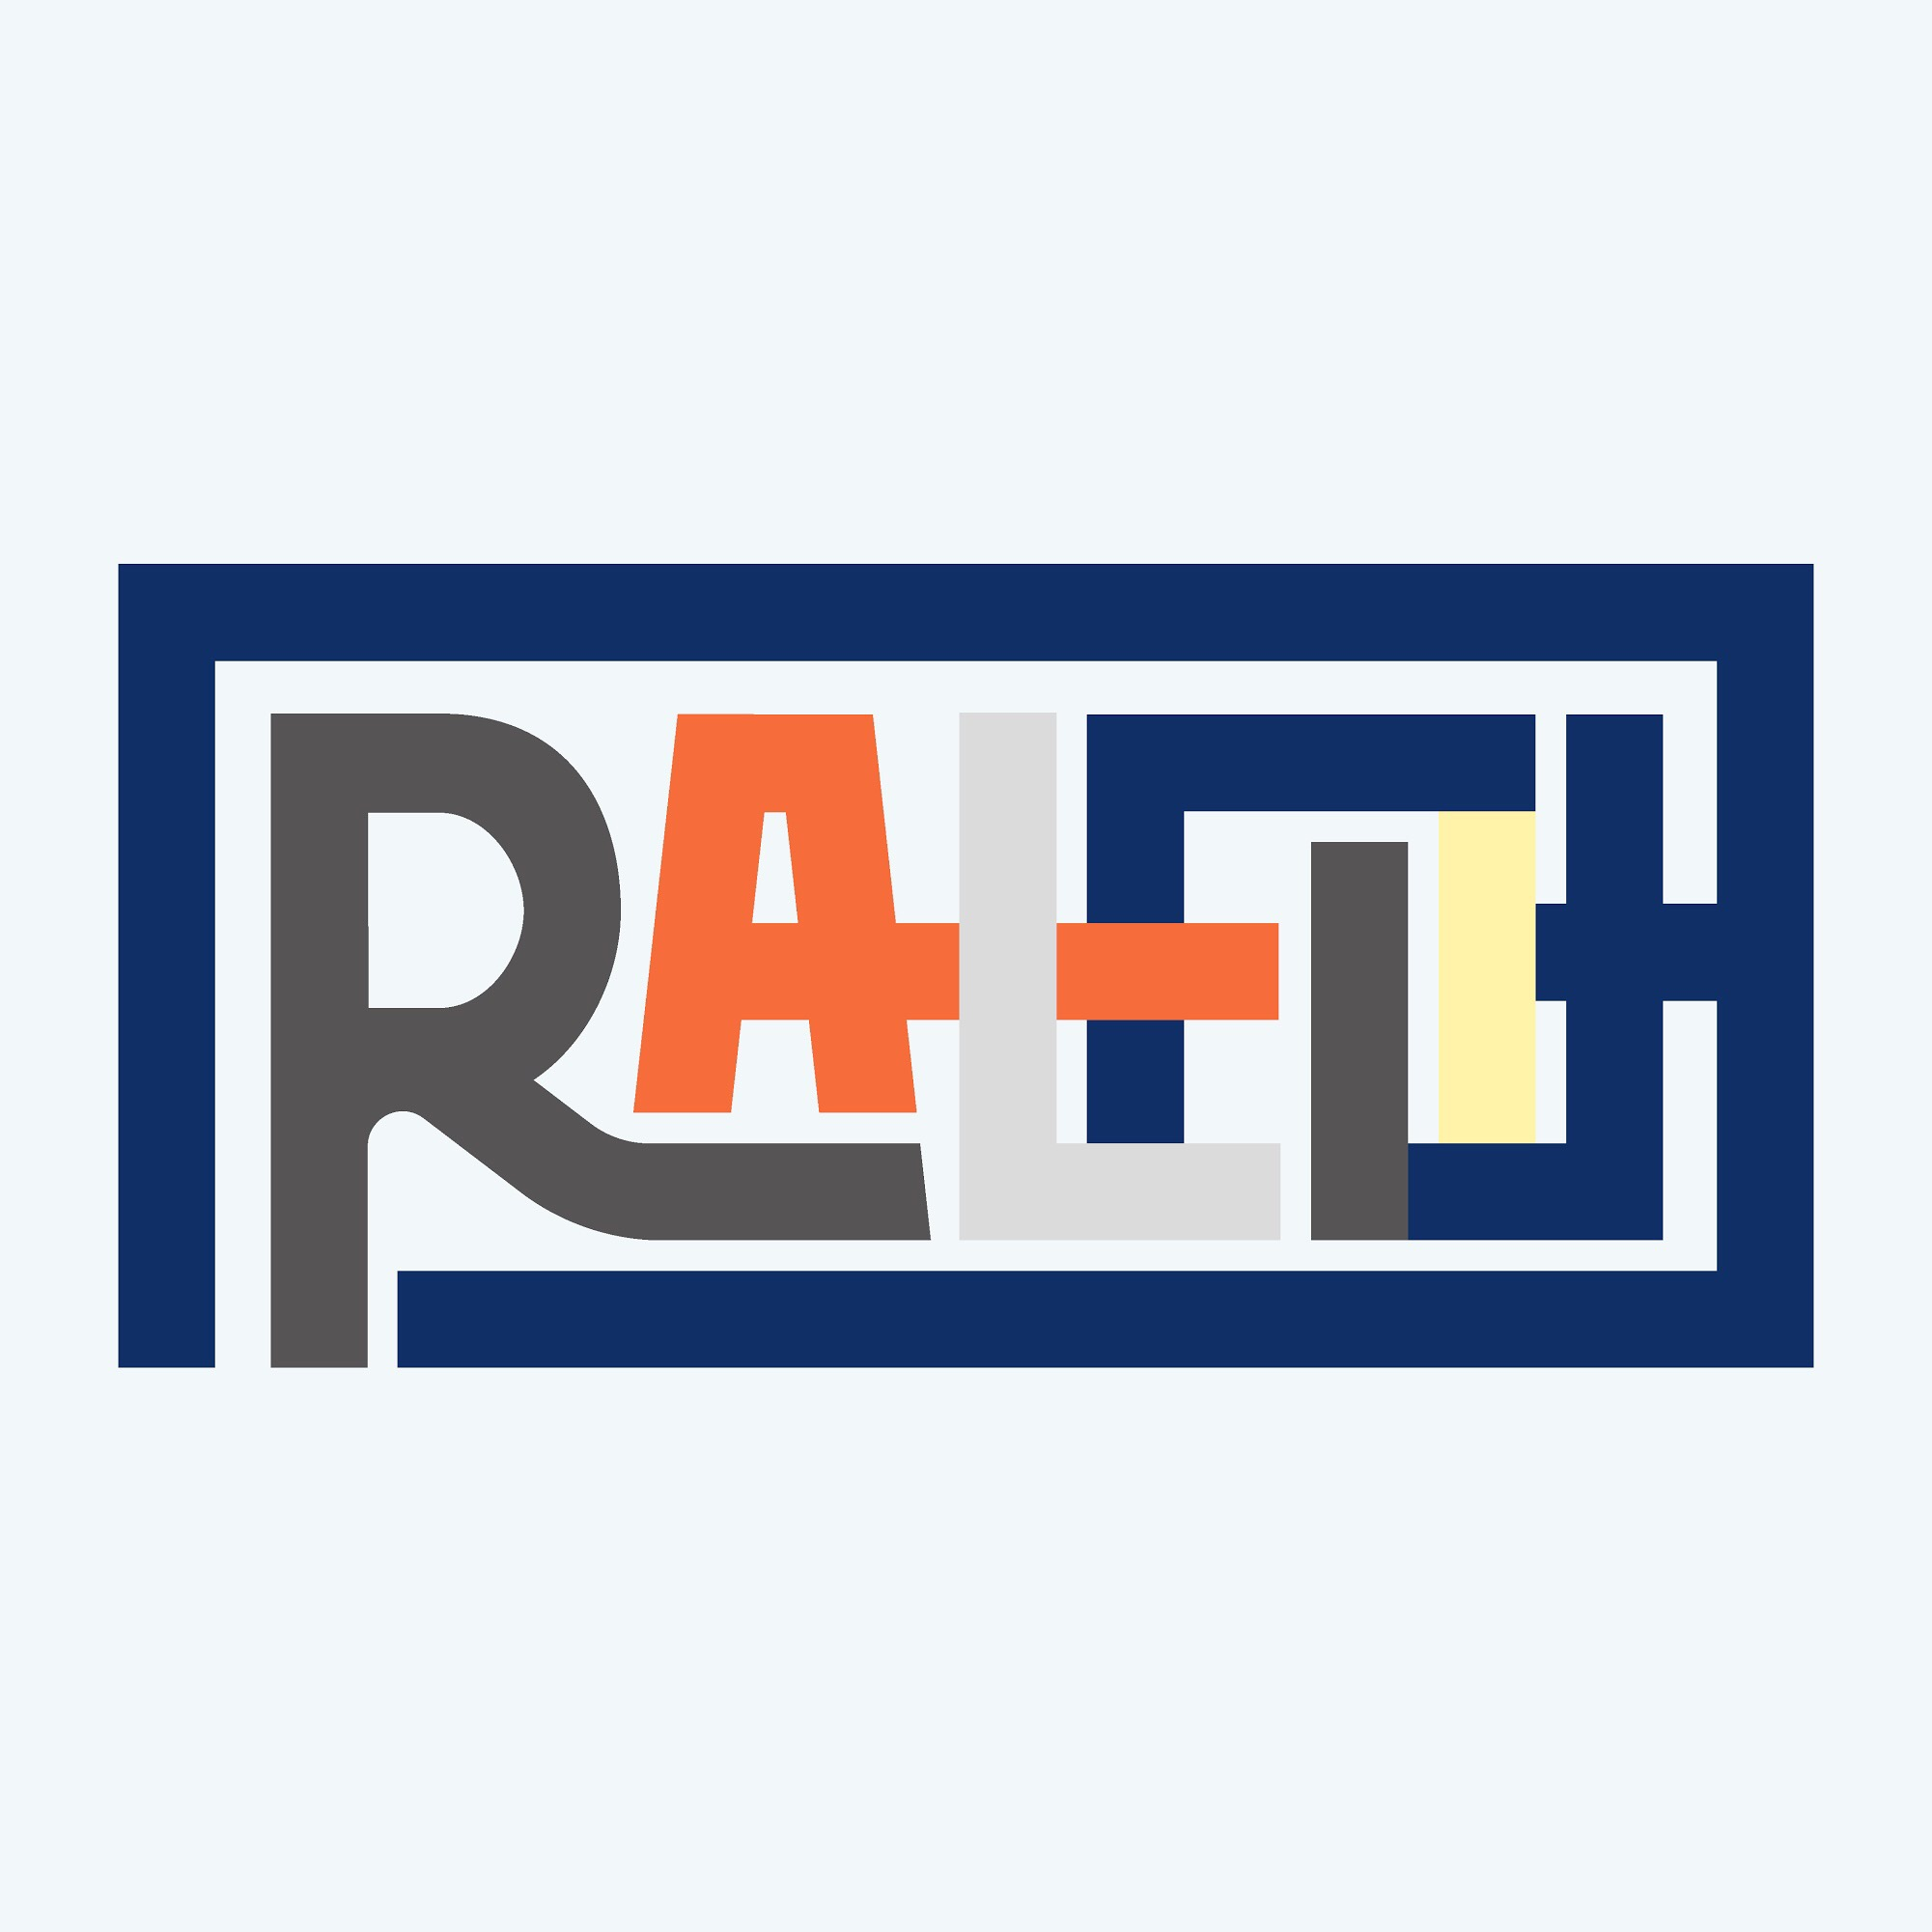 Raleigh NC Illustrative Logo Concept by Kenzi Green Design #logodesign #raleighnc #citybranding